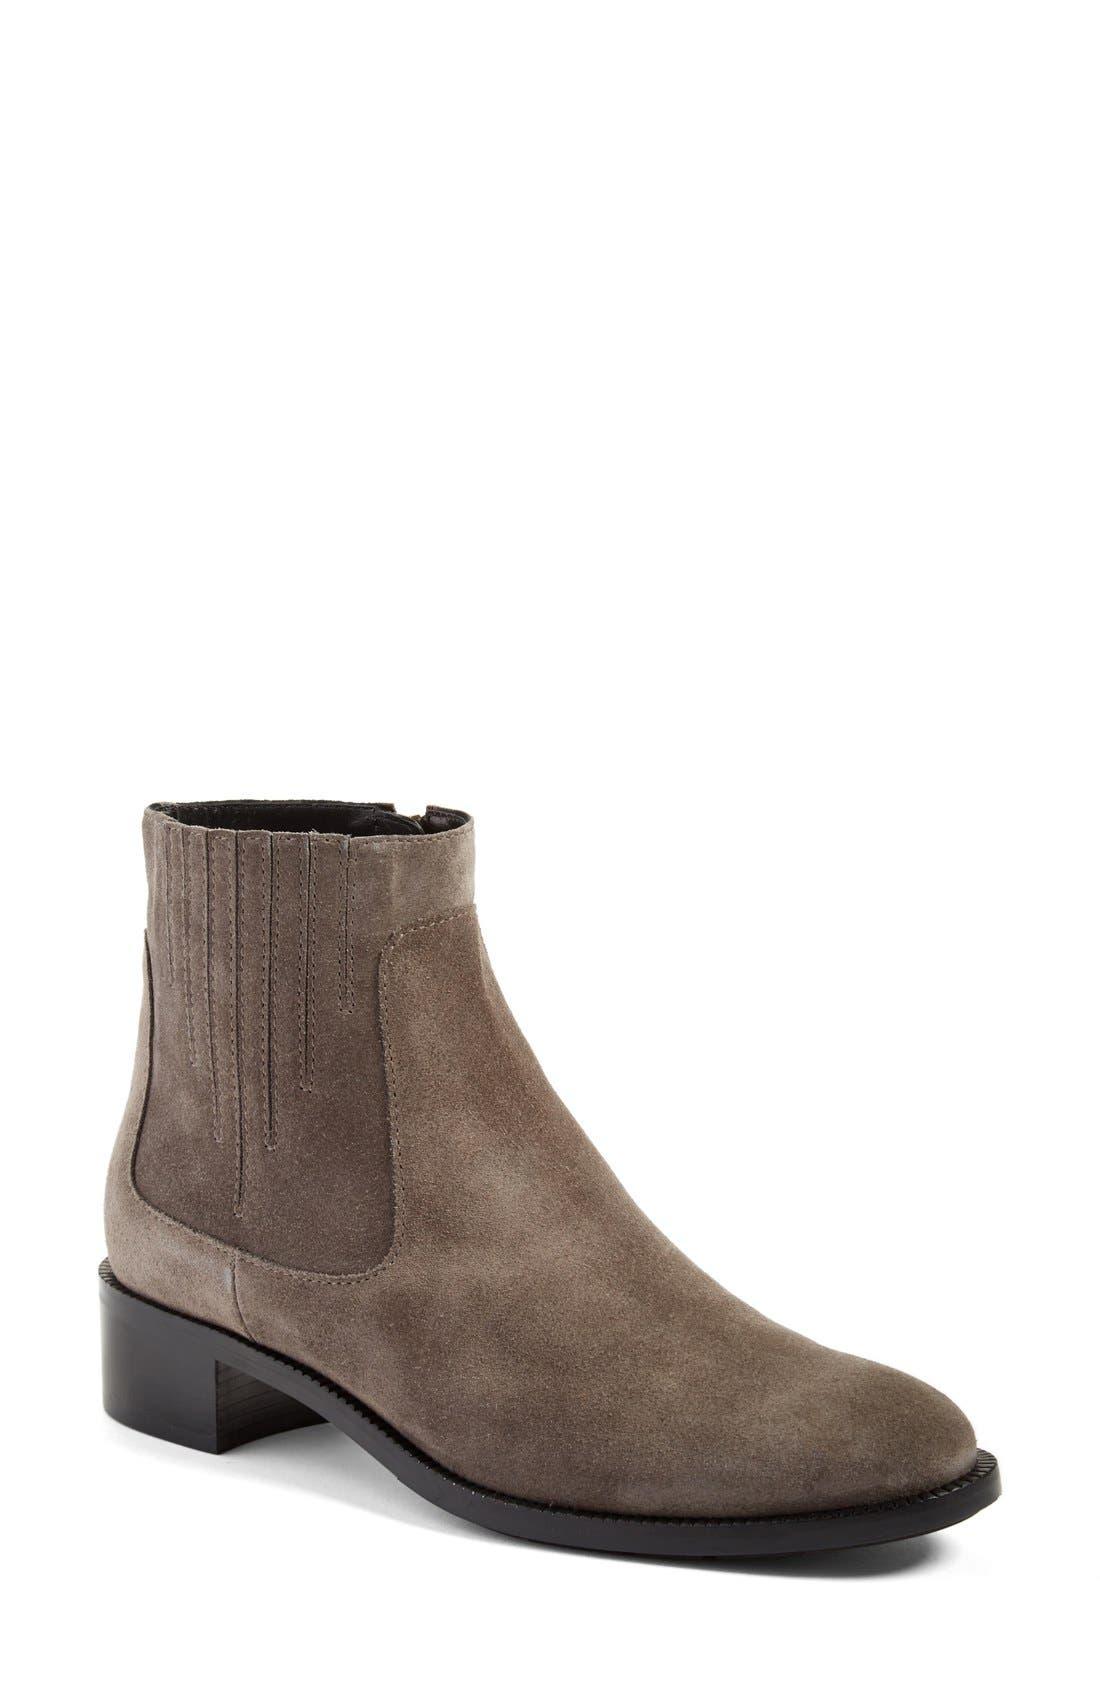 Main Image - Aquatalia 'Oribella' Weatherproof Leather Bootie (Women)